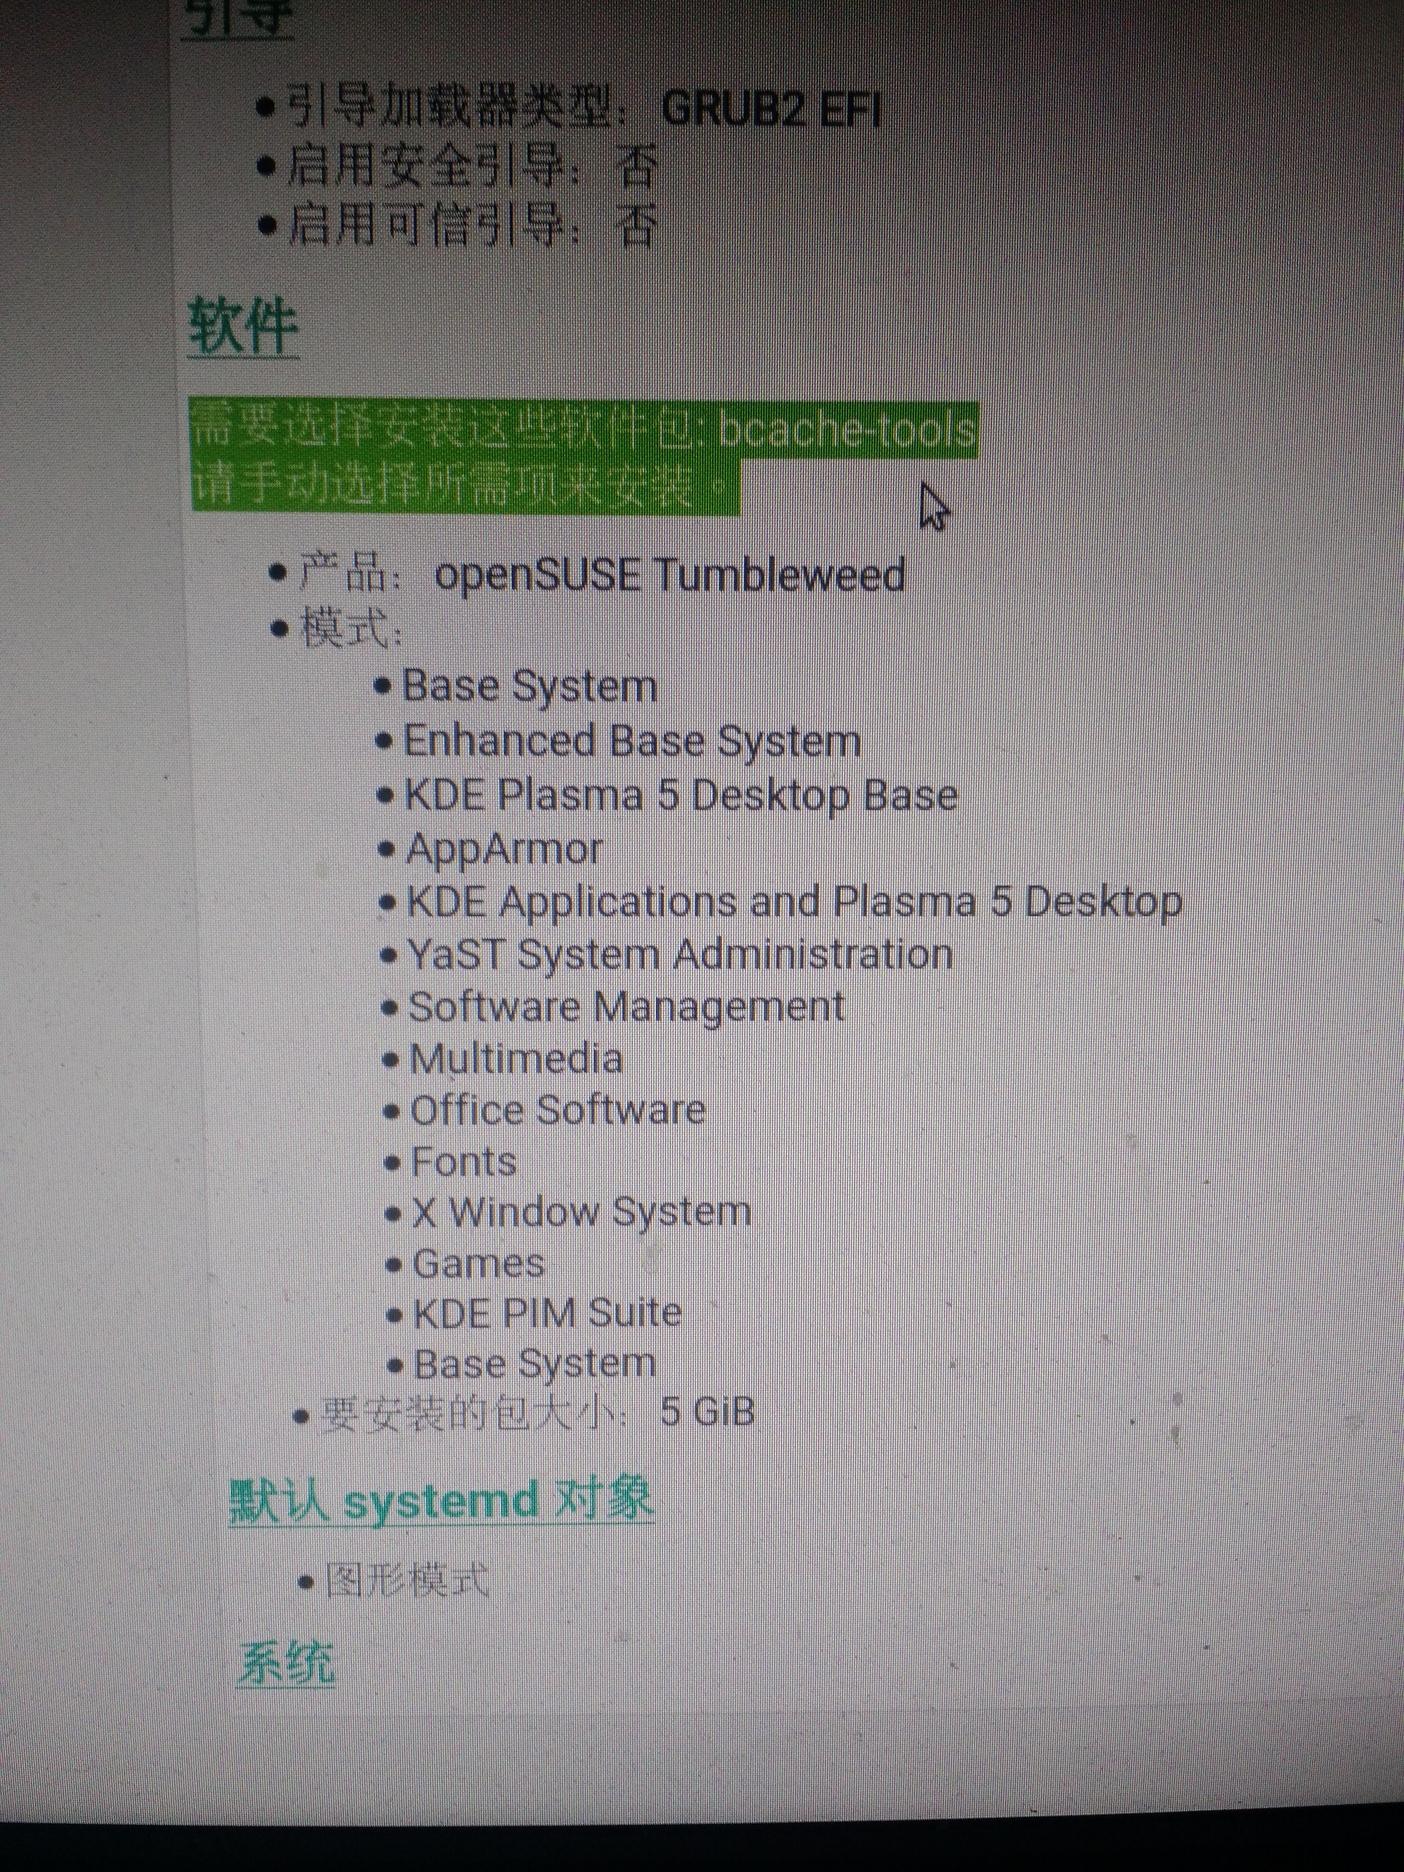 openSUSE 安装程序一个挺有毛病的地方- 本地化- openSUSE 中文论坛